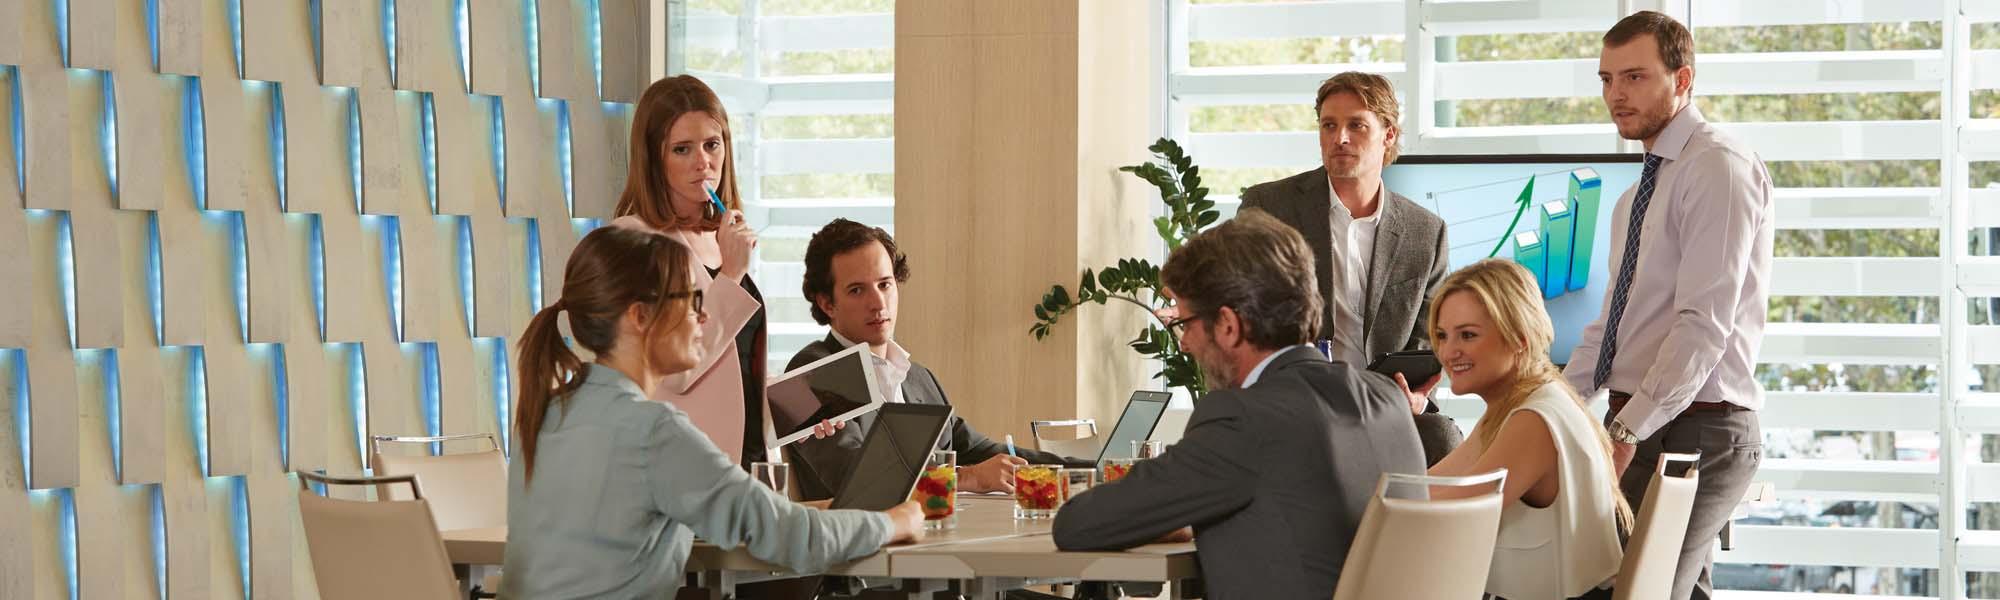 Consumer meeting room